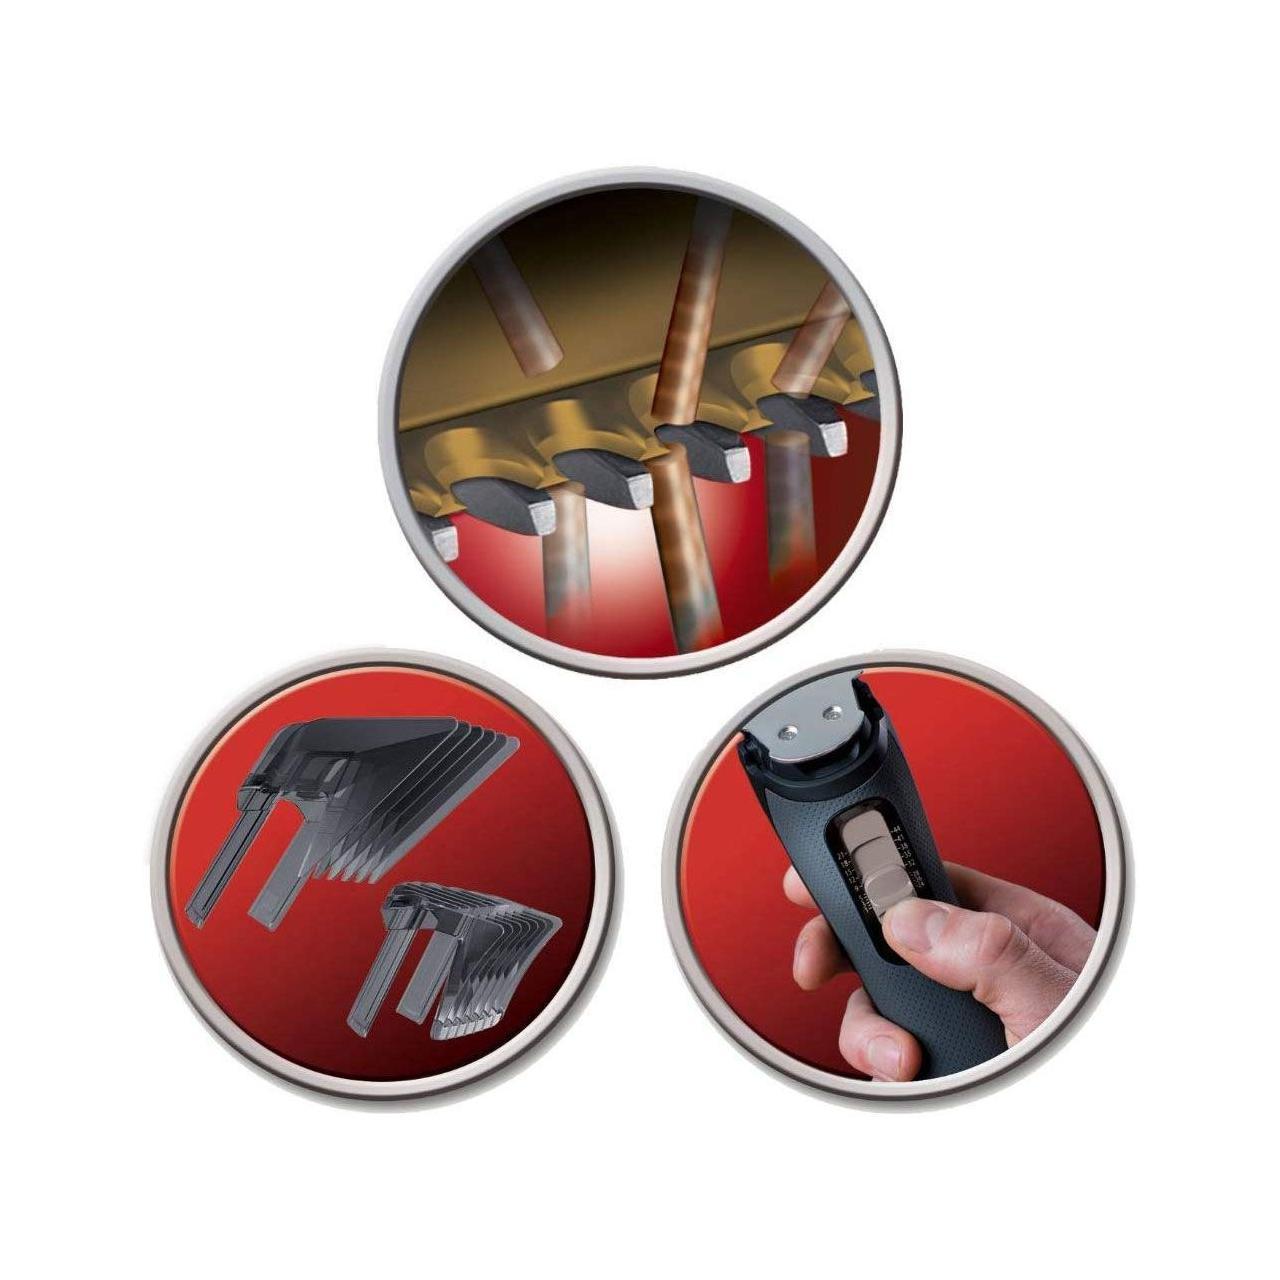 Aparat de tuns Remington Pro Power Titanium Plus HC7150, Li-Ion, 0.5-42 mm, lame titan, Negru/Argintiu